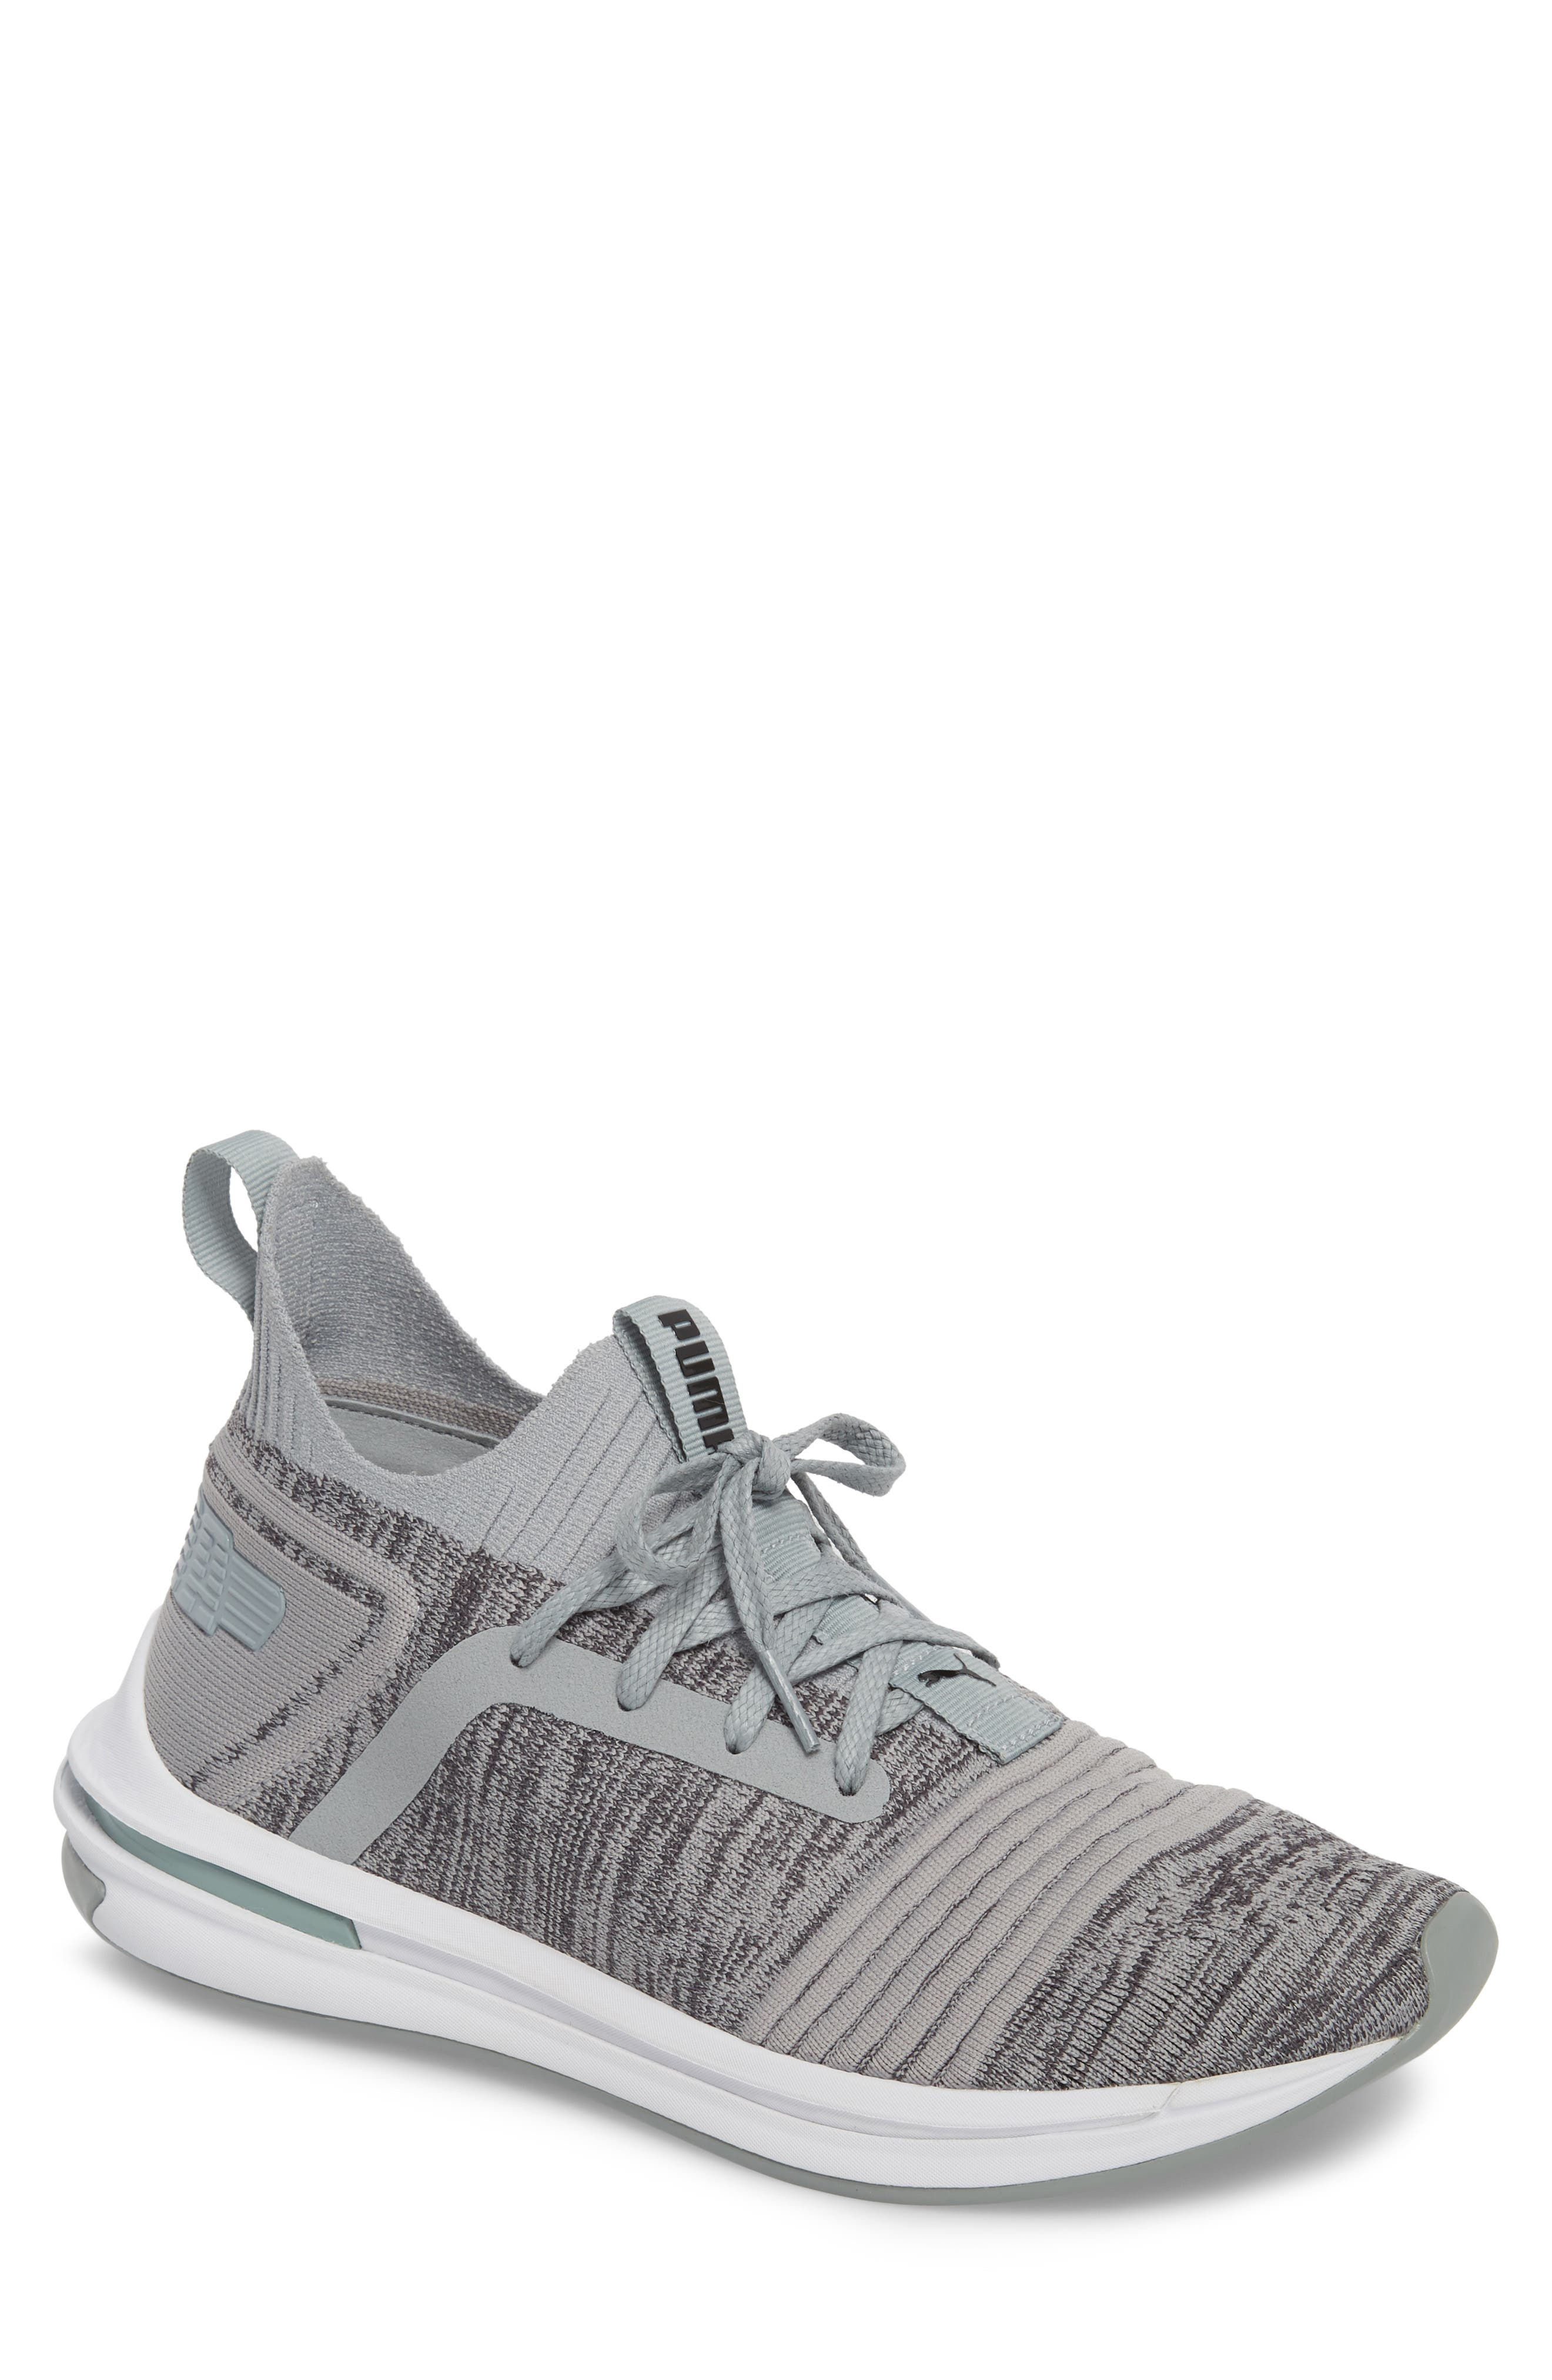 IGNITE Limitless SR evoKNIT Sneaker,                         Main,                         color, Quarry